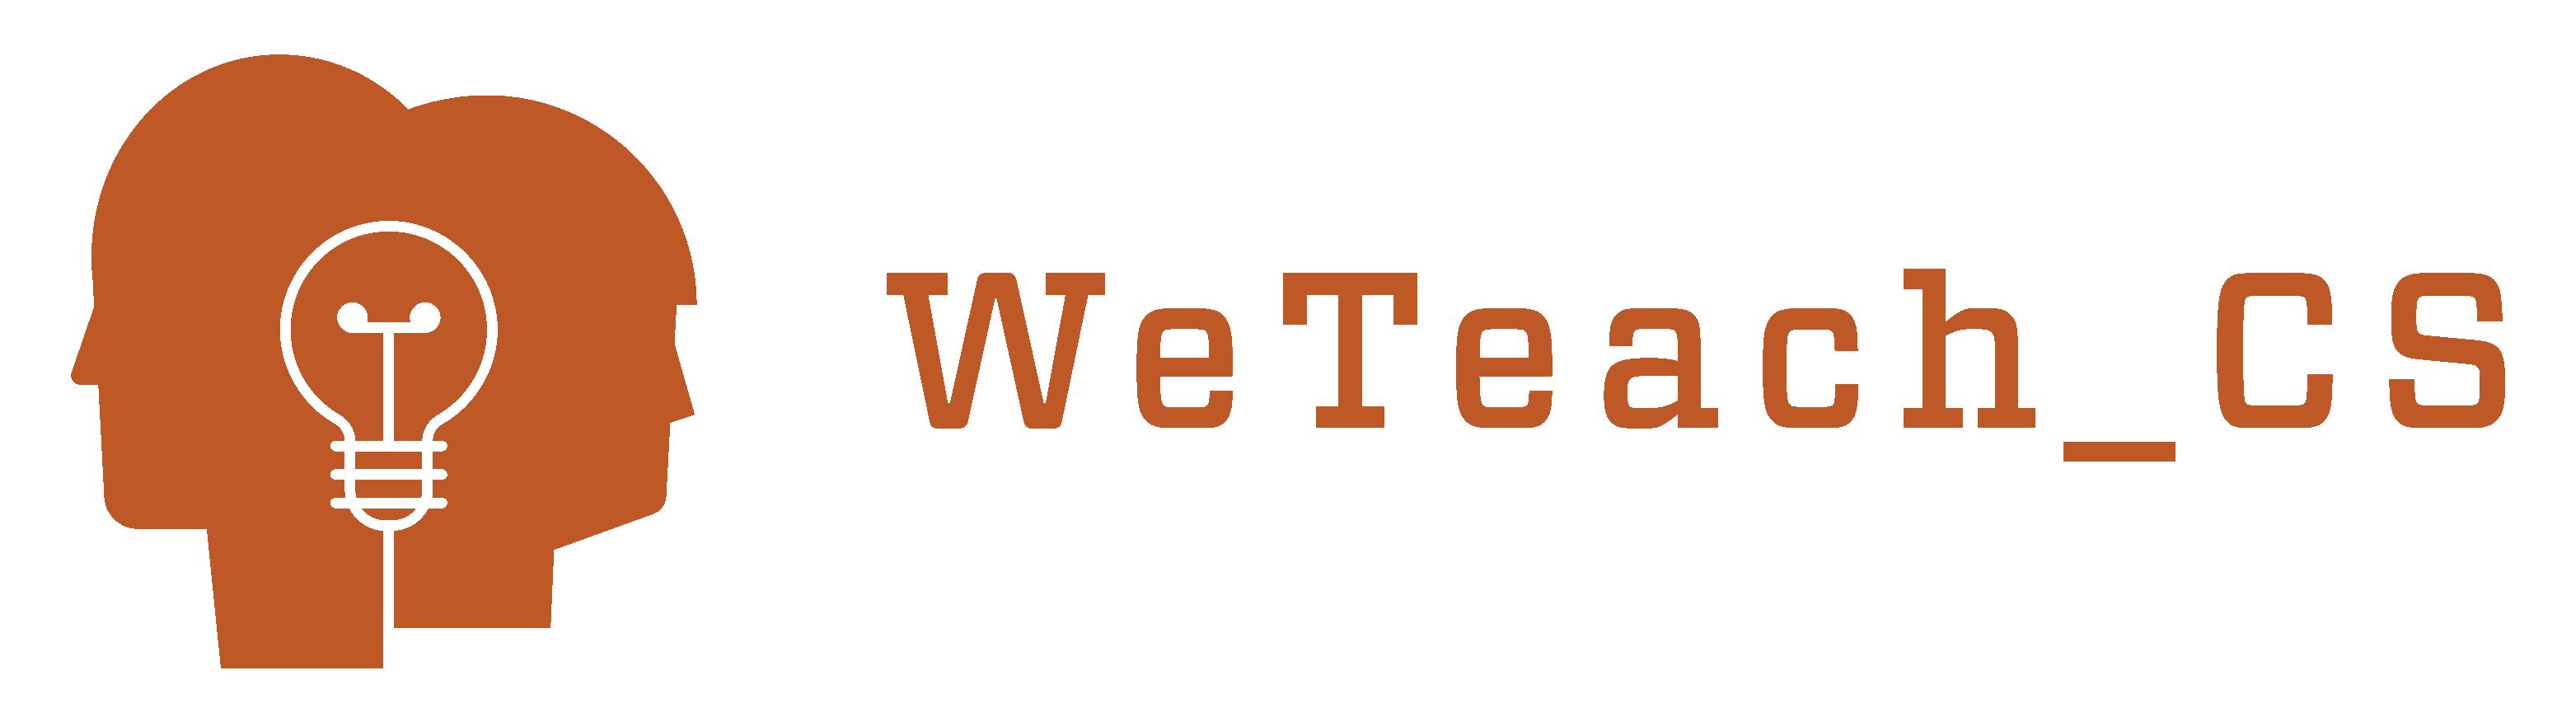 WeTeach_CS